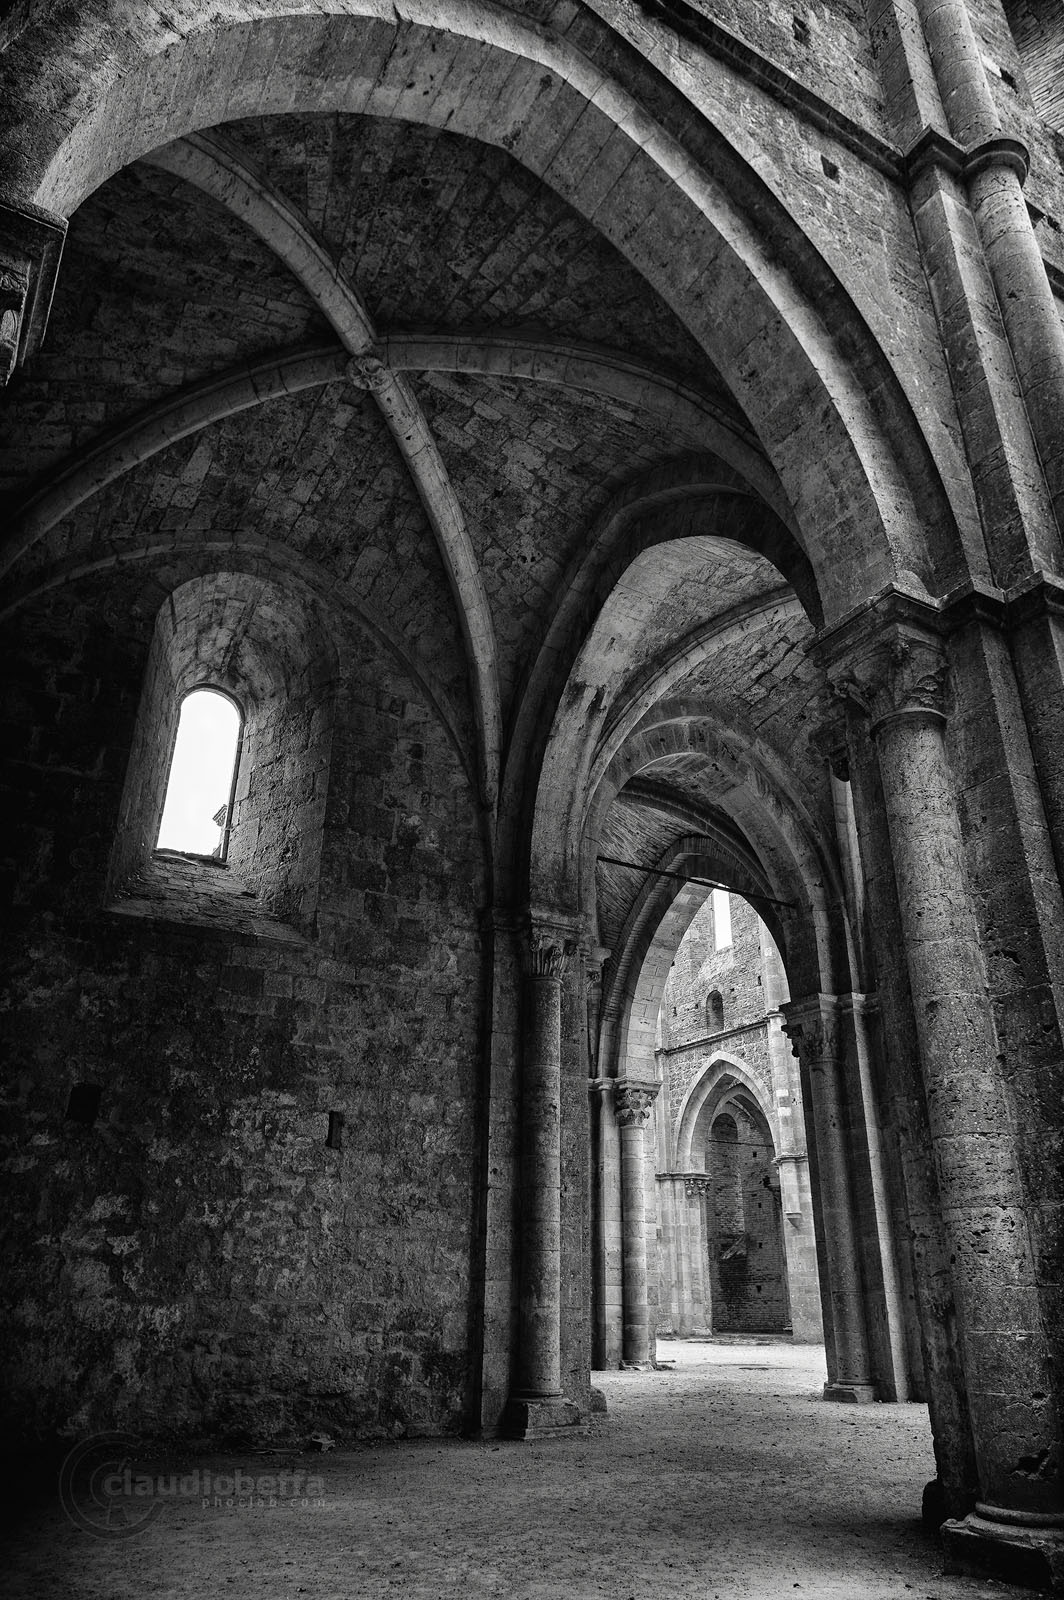 San Galgano, Abbey, Nave, Windows, Layers, Light, Shadows, Capitals, Arches, Ruin, Tuscany, Italy, Nature, History, Architecture